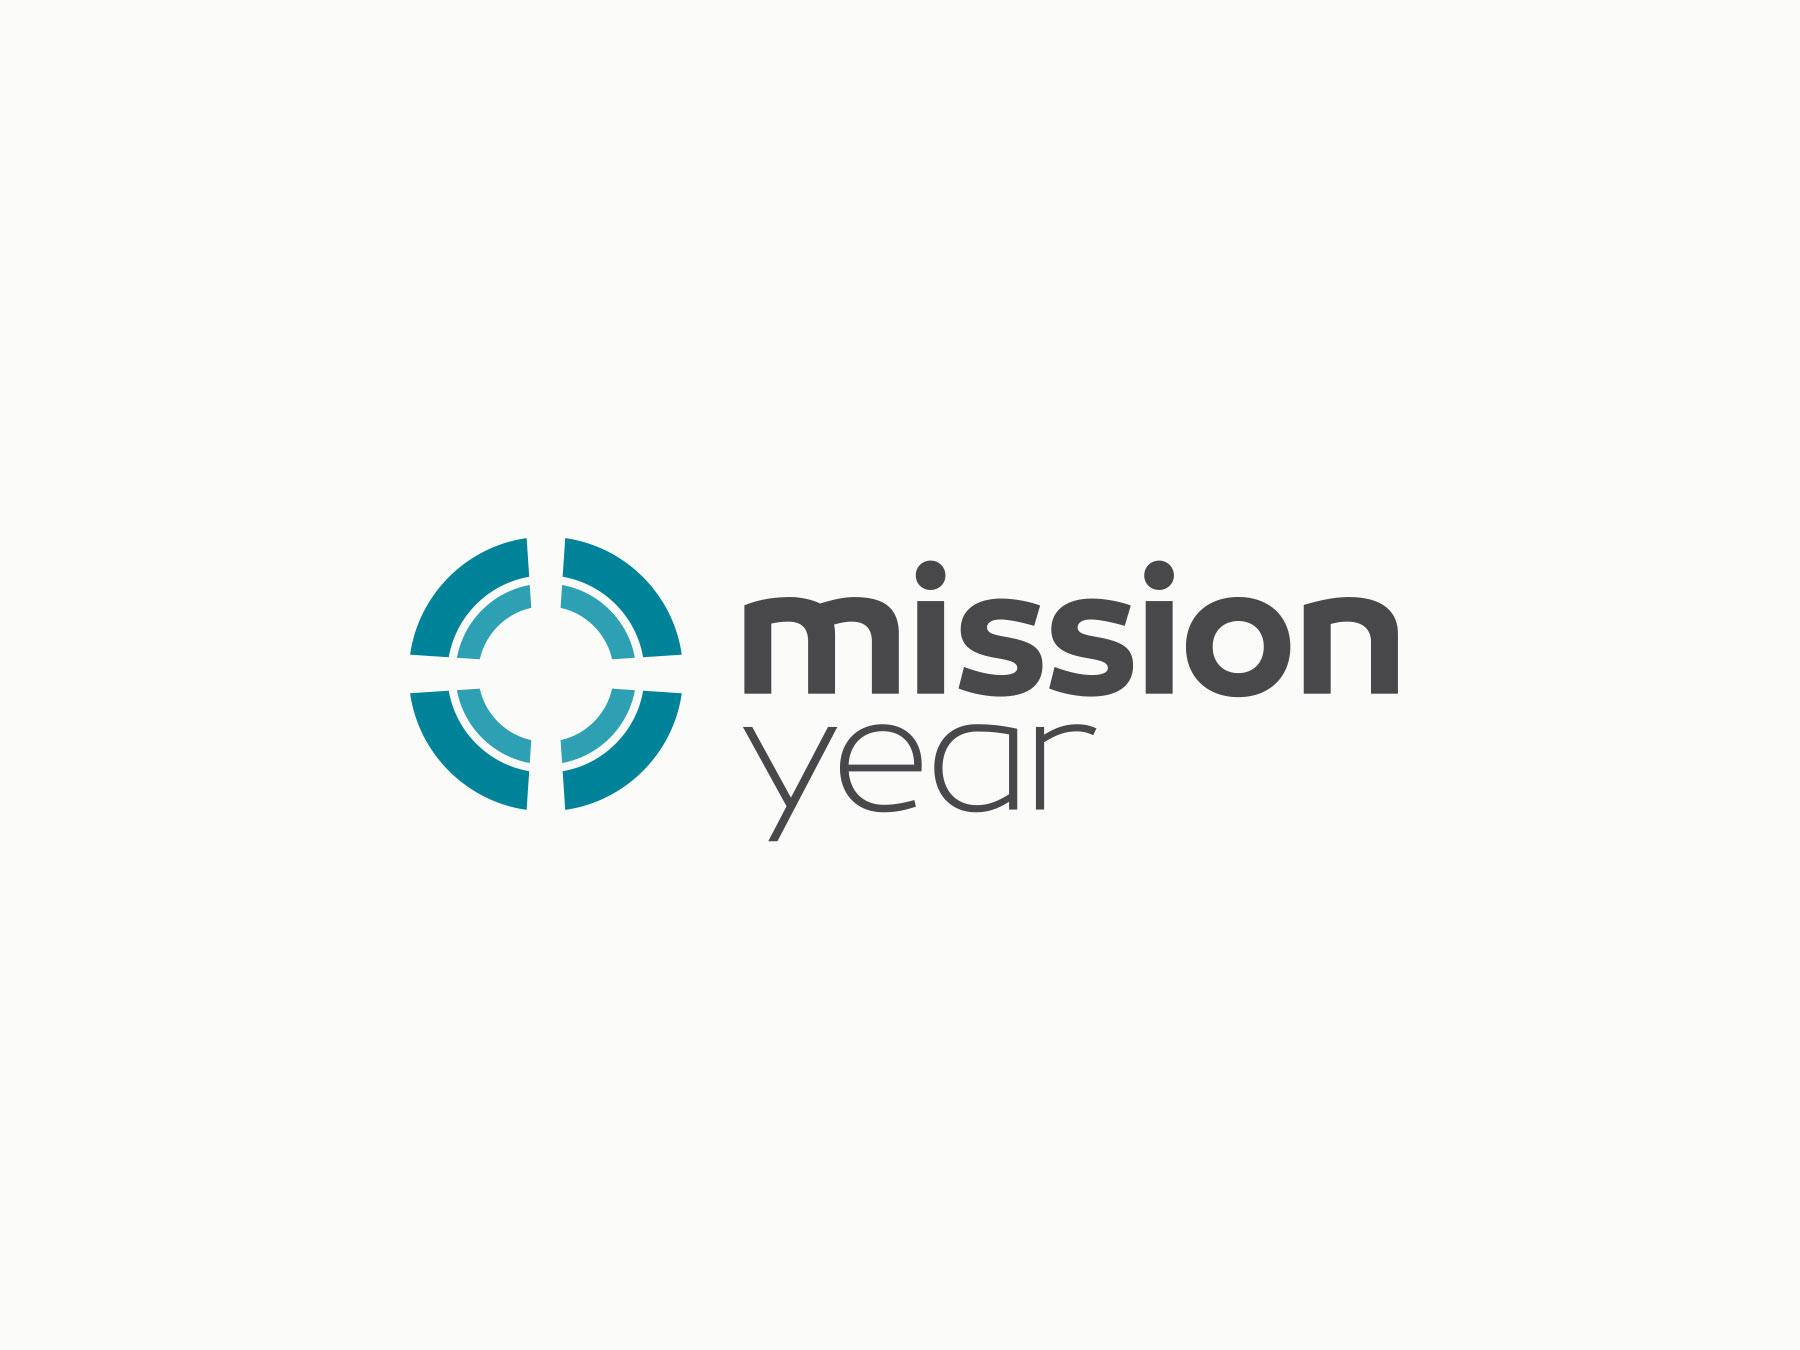 Mission Year brandmark